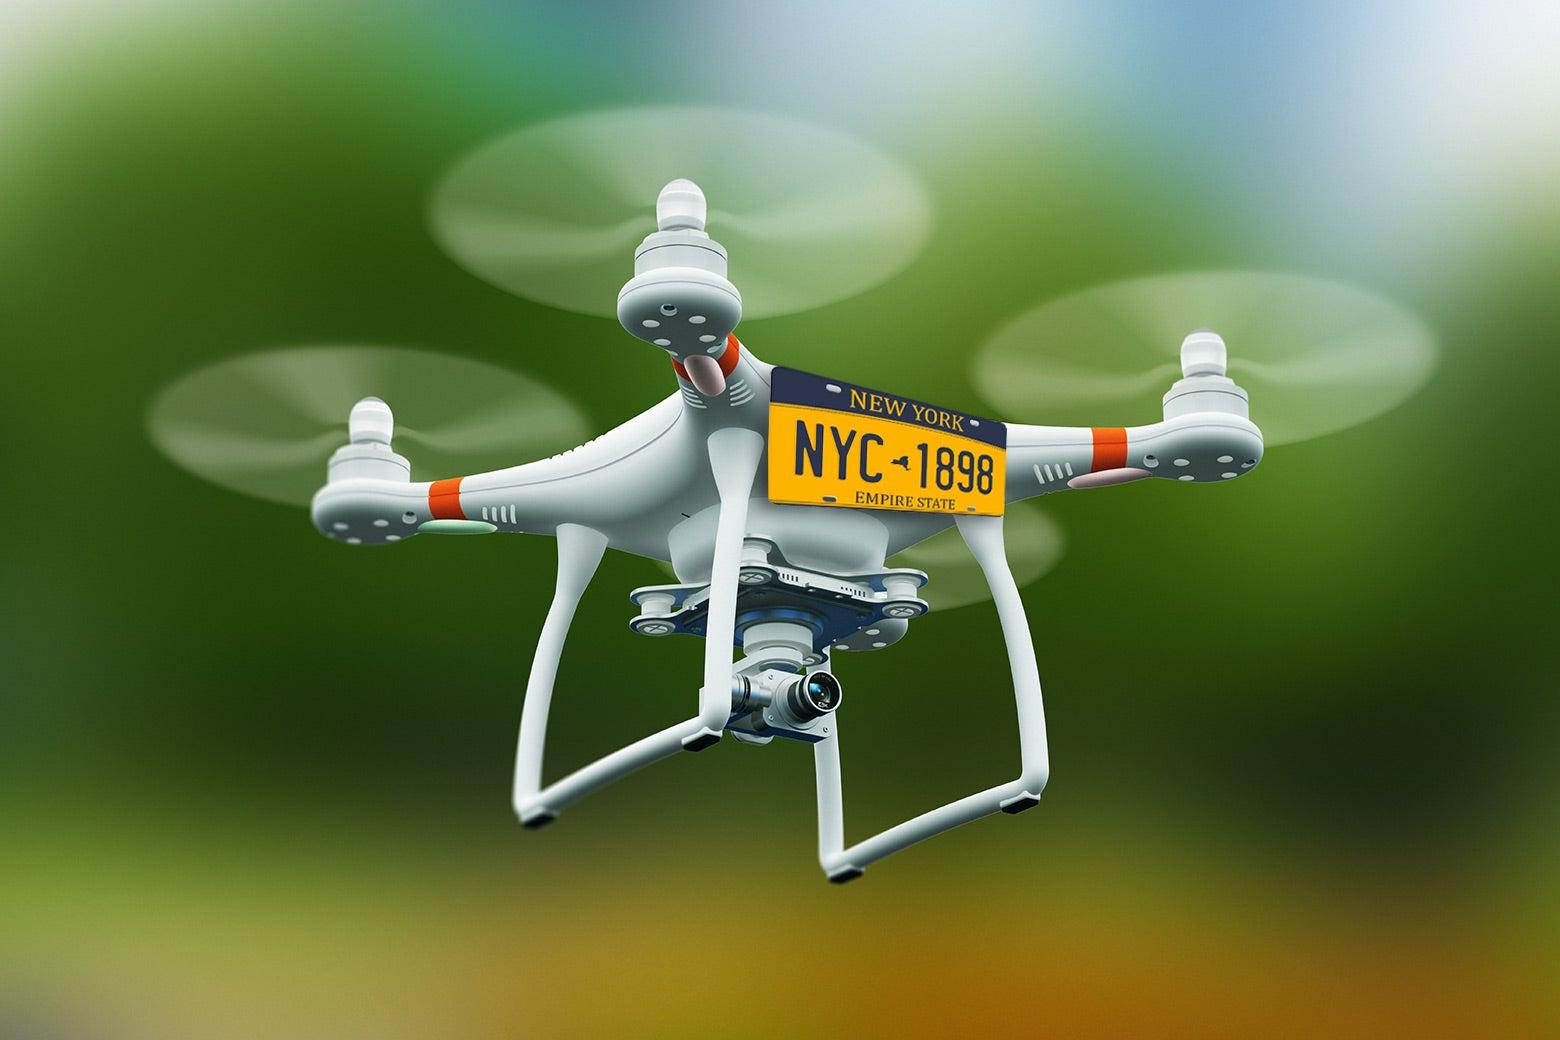 slate.com - Faine Greenwood - Drone Pilots Deserve Privacy Too